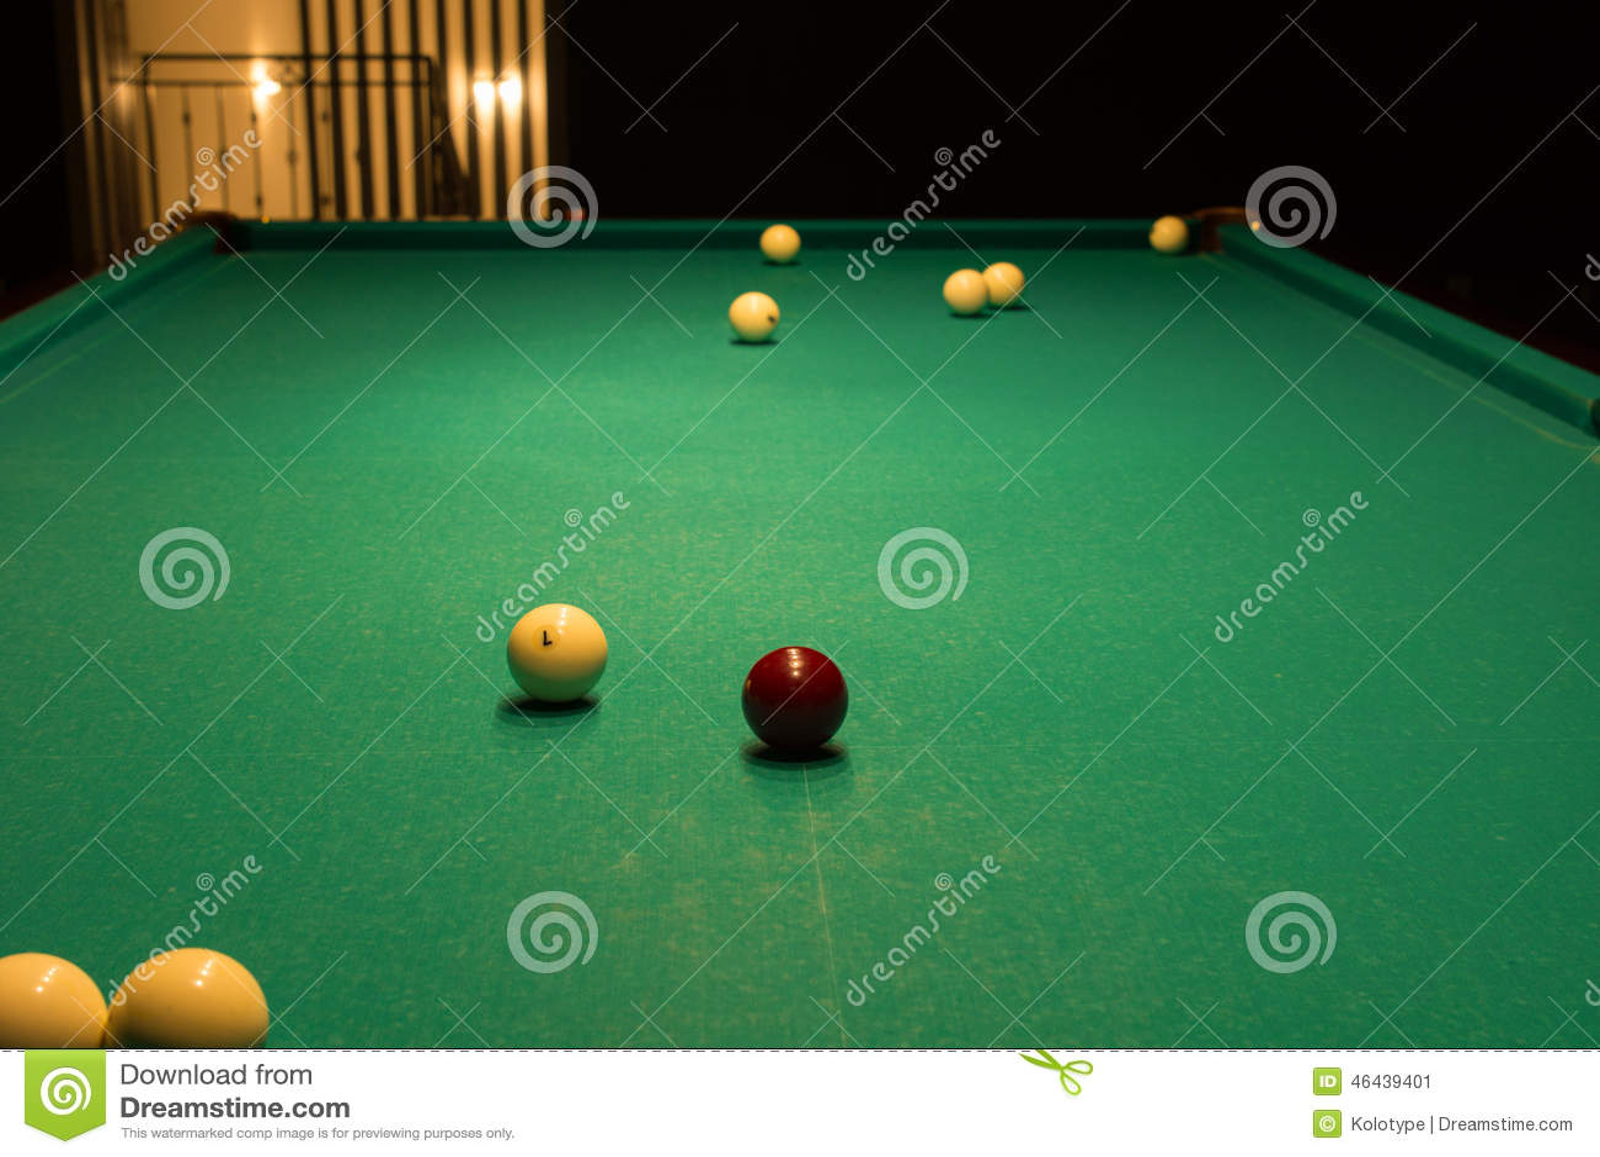 Pool Table Balls Scattered Billiard Balls Scattered on